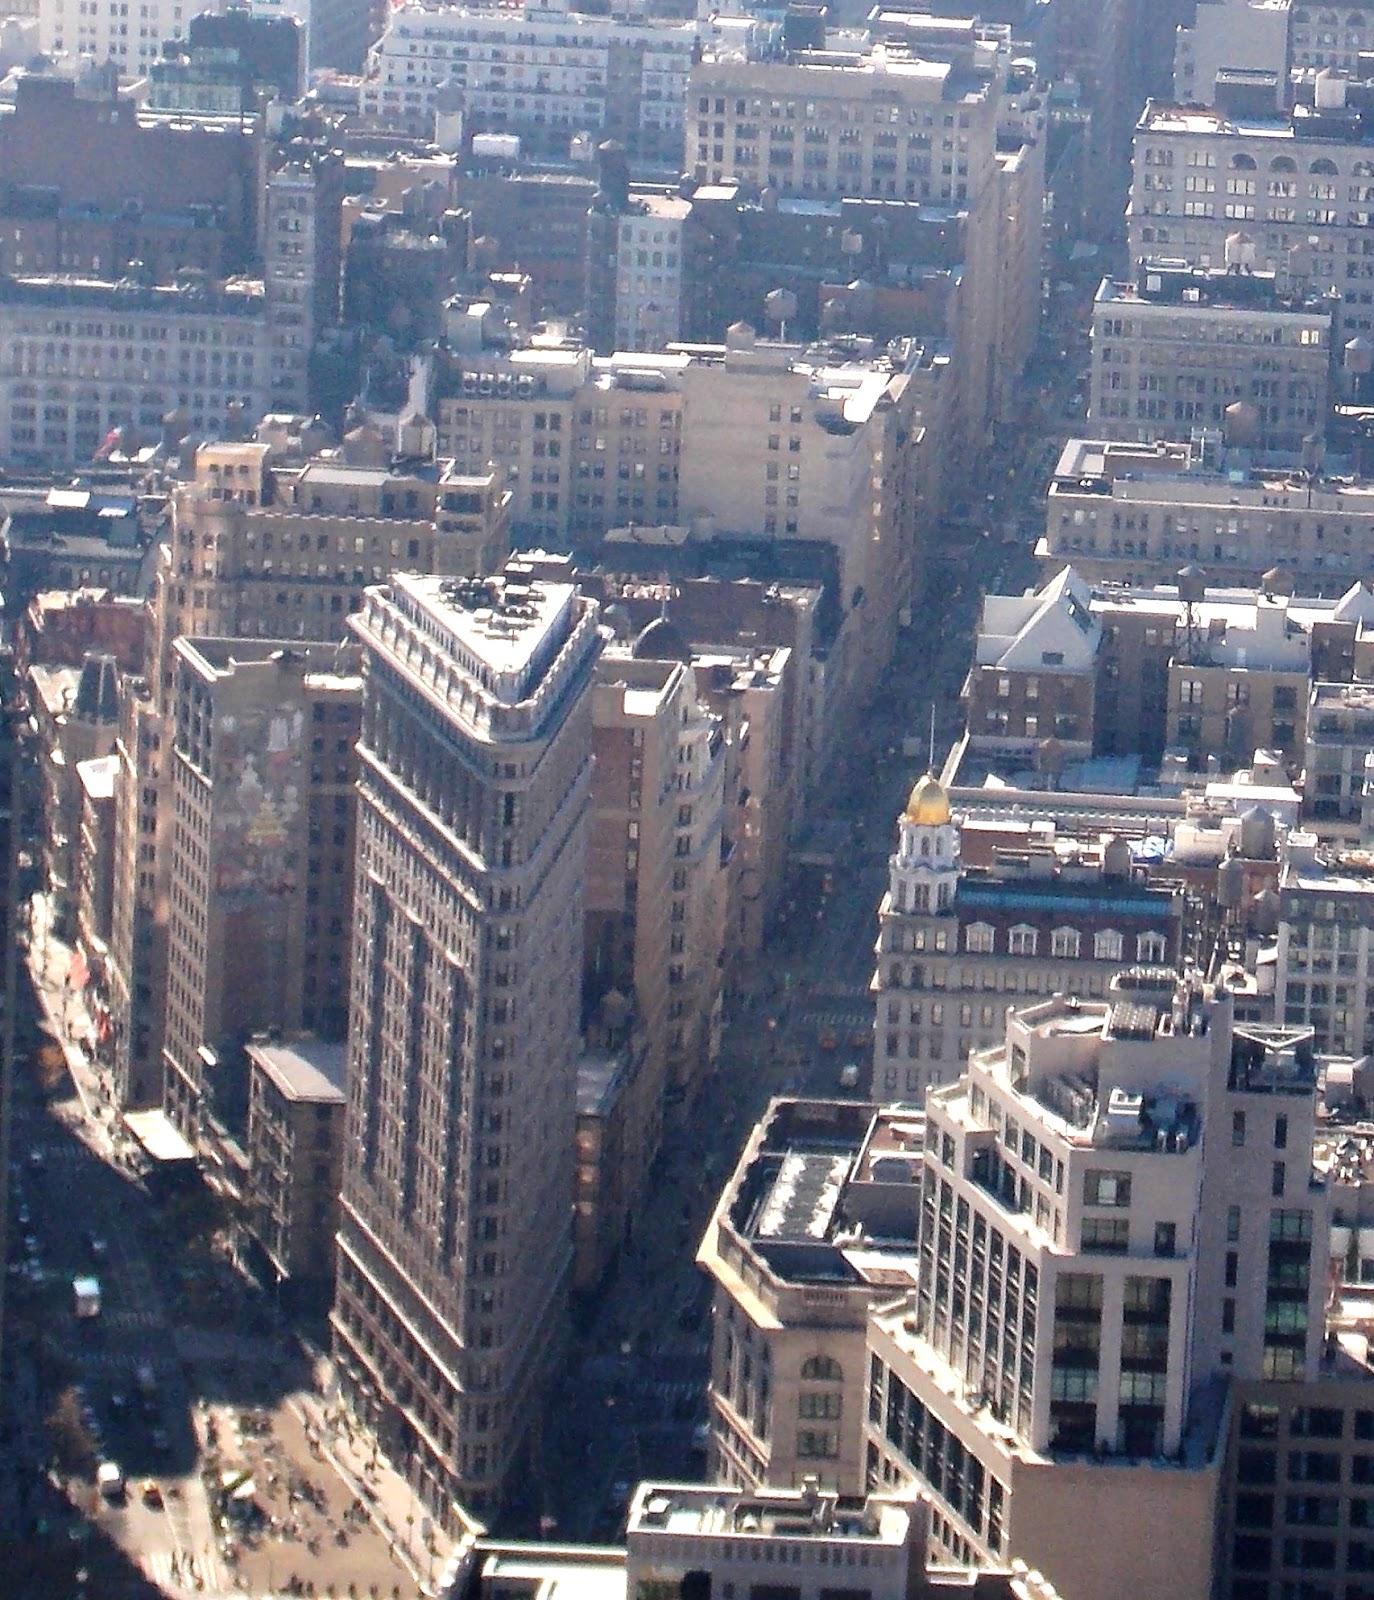 Flat Nyc: CHINAR SHADE : FLAT IRON BUILDING MANHATTAN NEW YORK